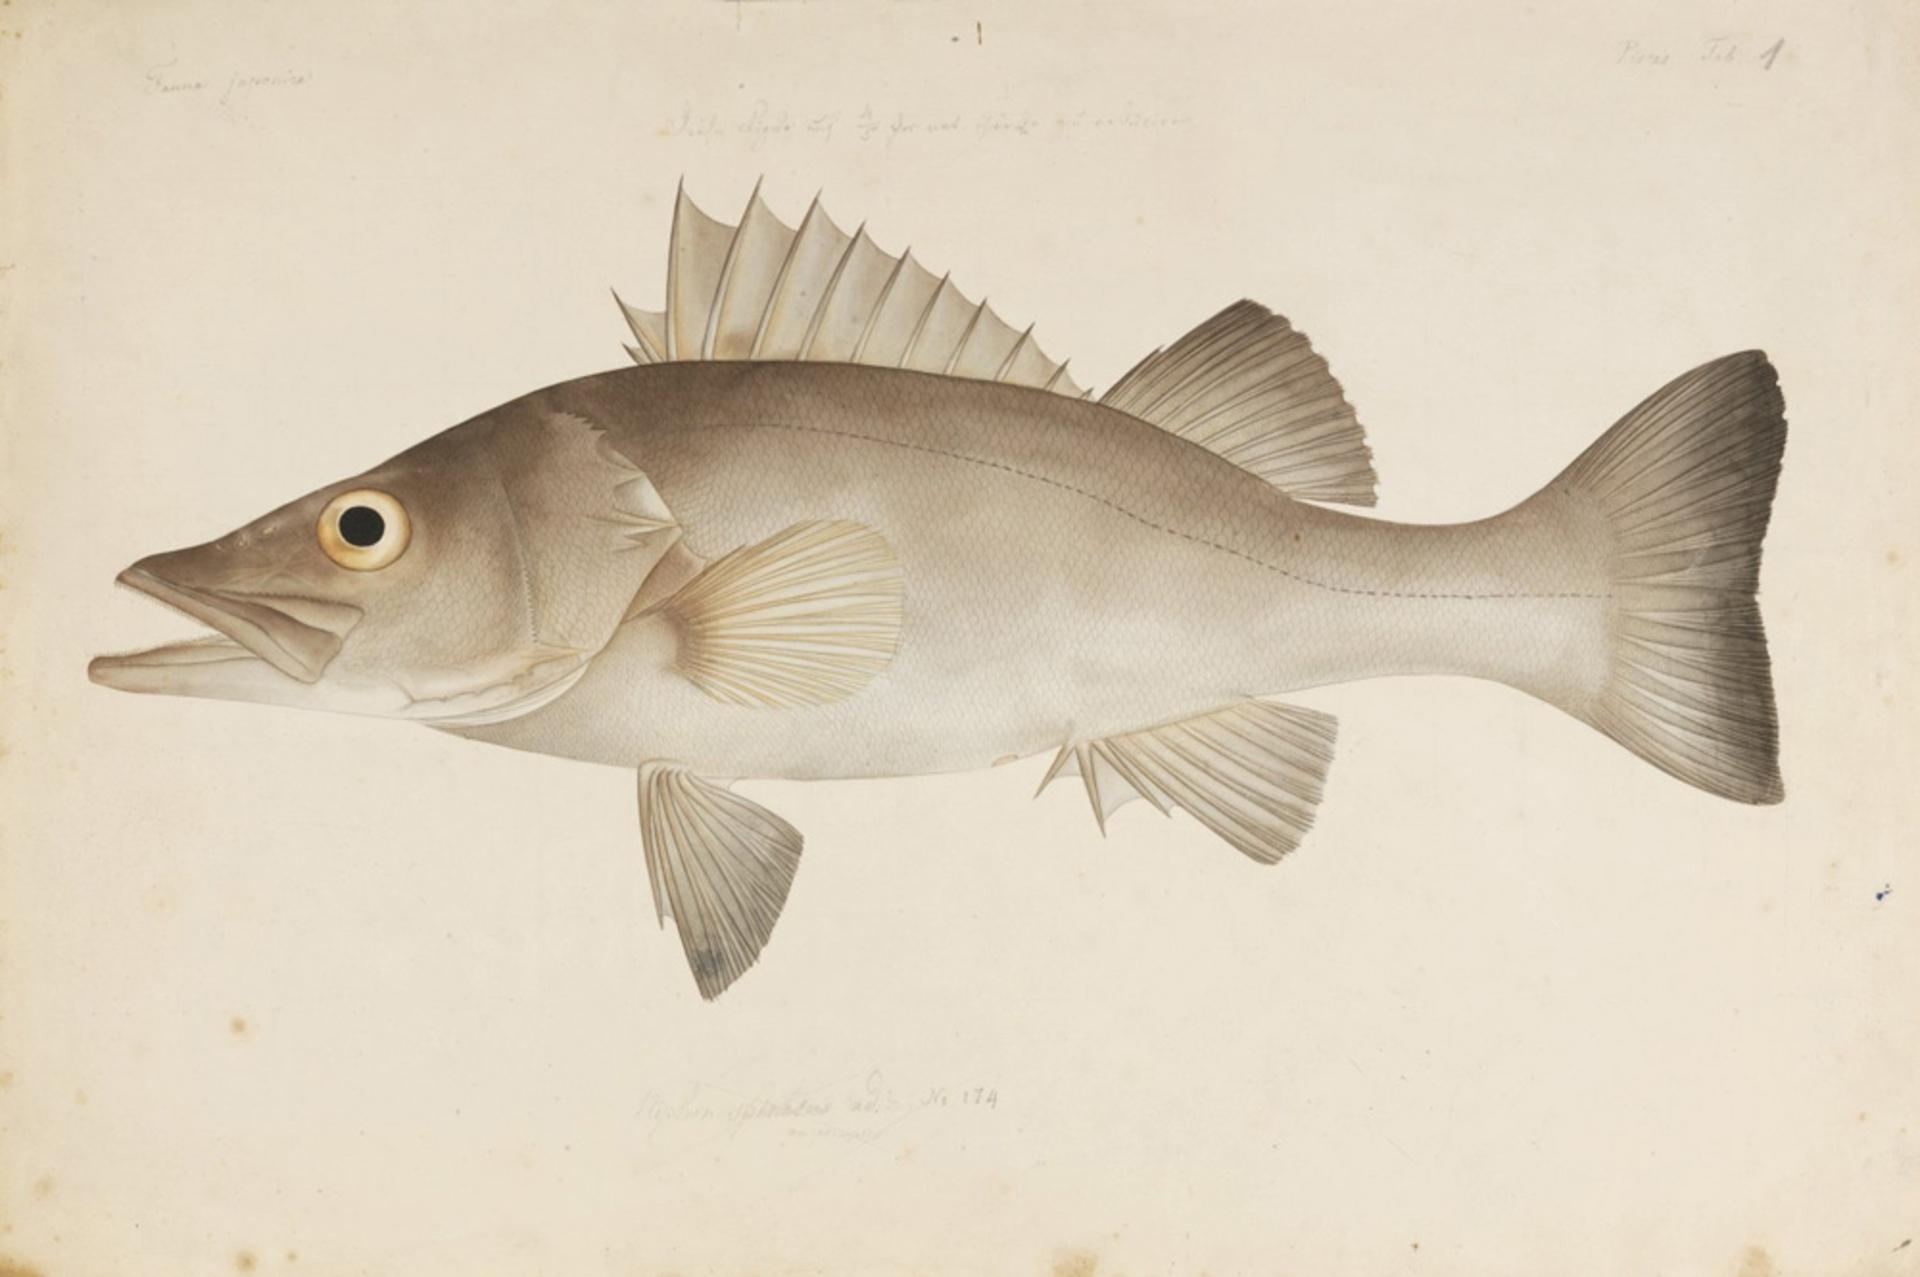 RMNH.ART.1 | Niphon spinosus Cuvier, 1828